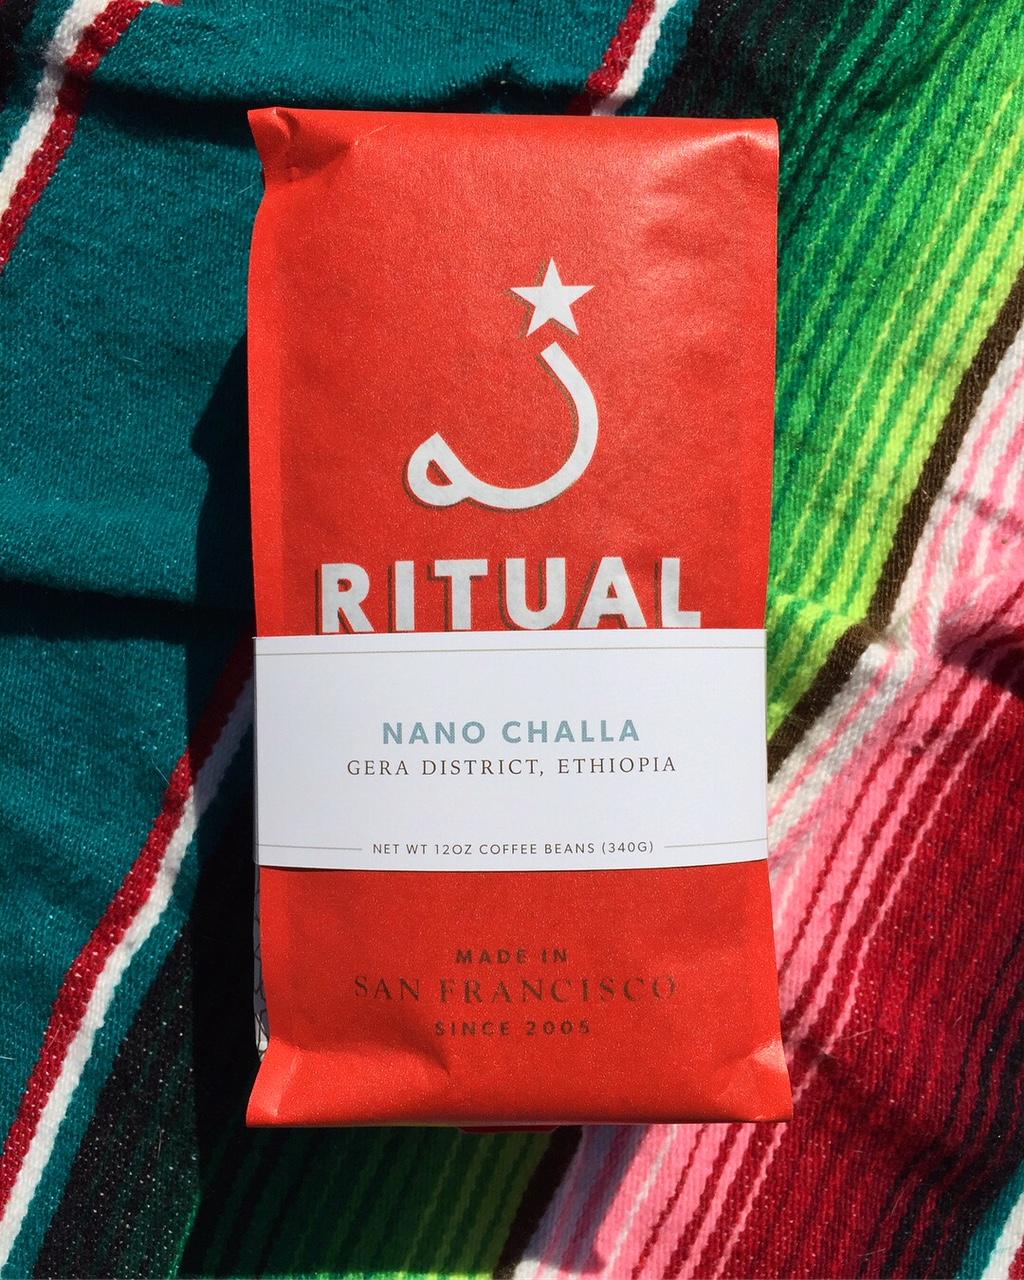 Ritual Nano Challa.JPG